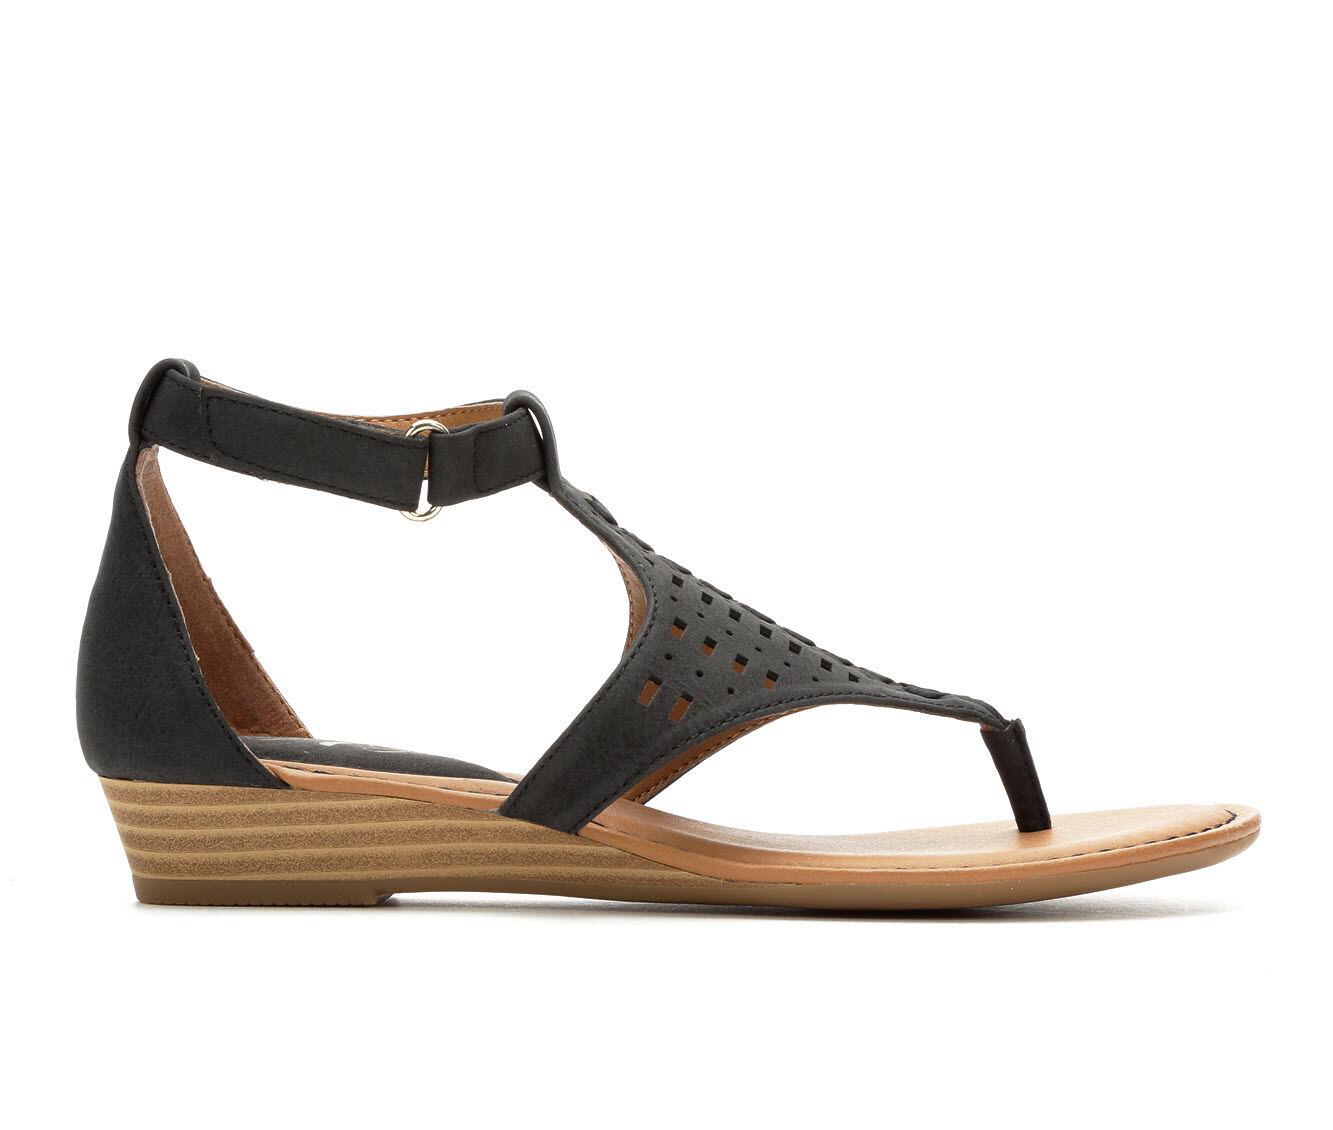 uk shoes_kd6699